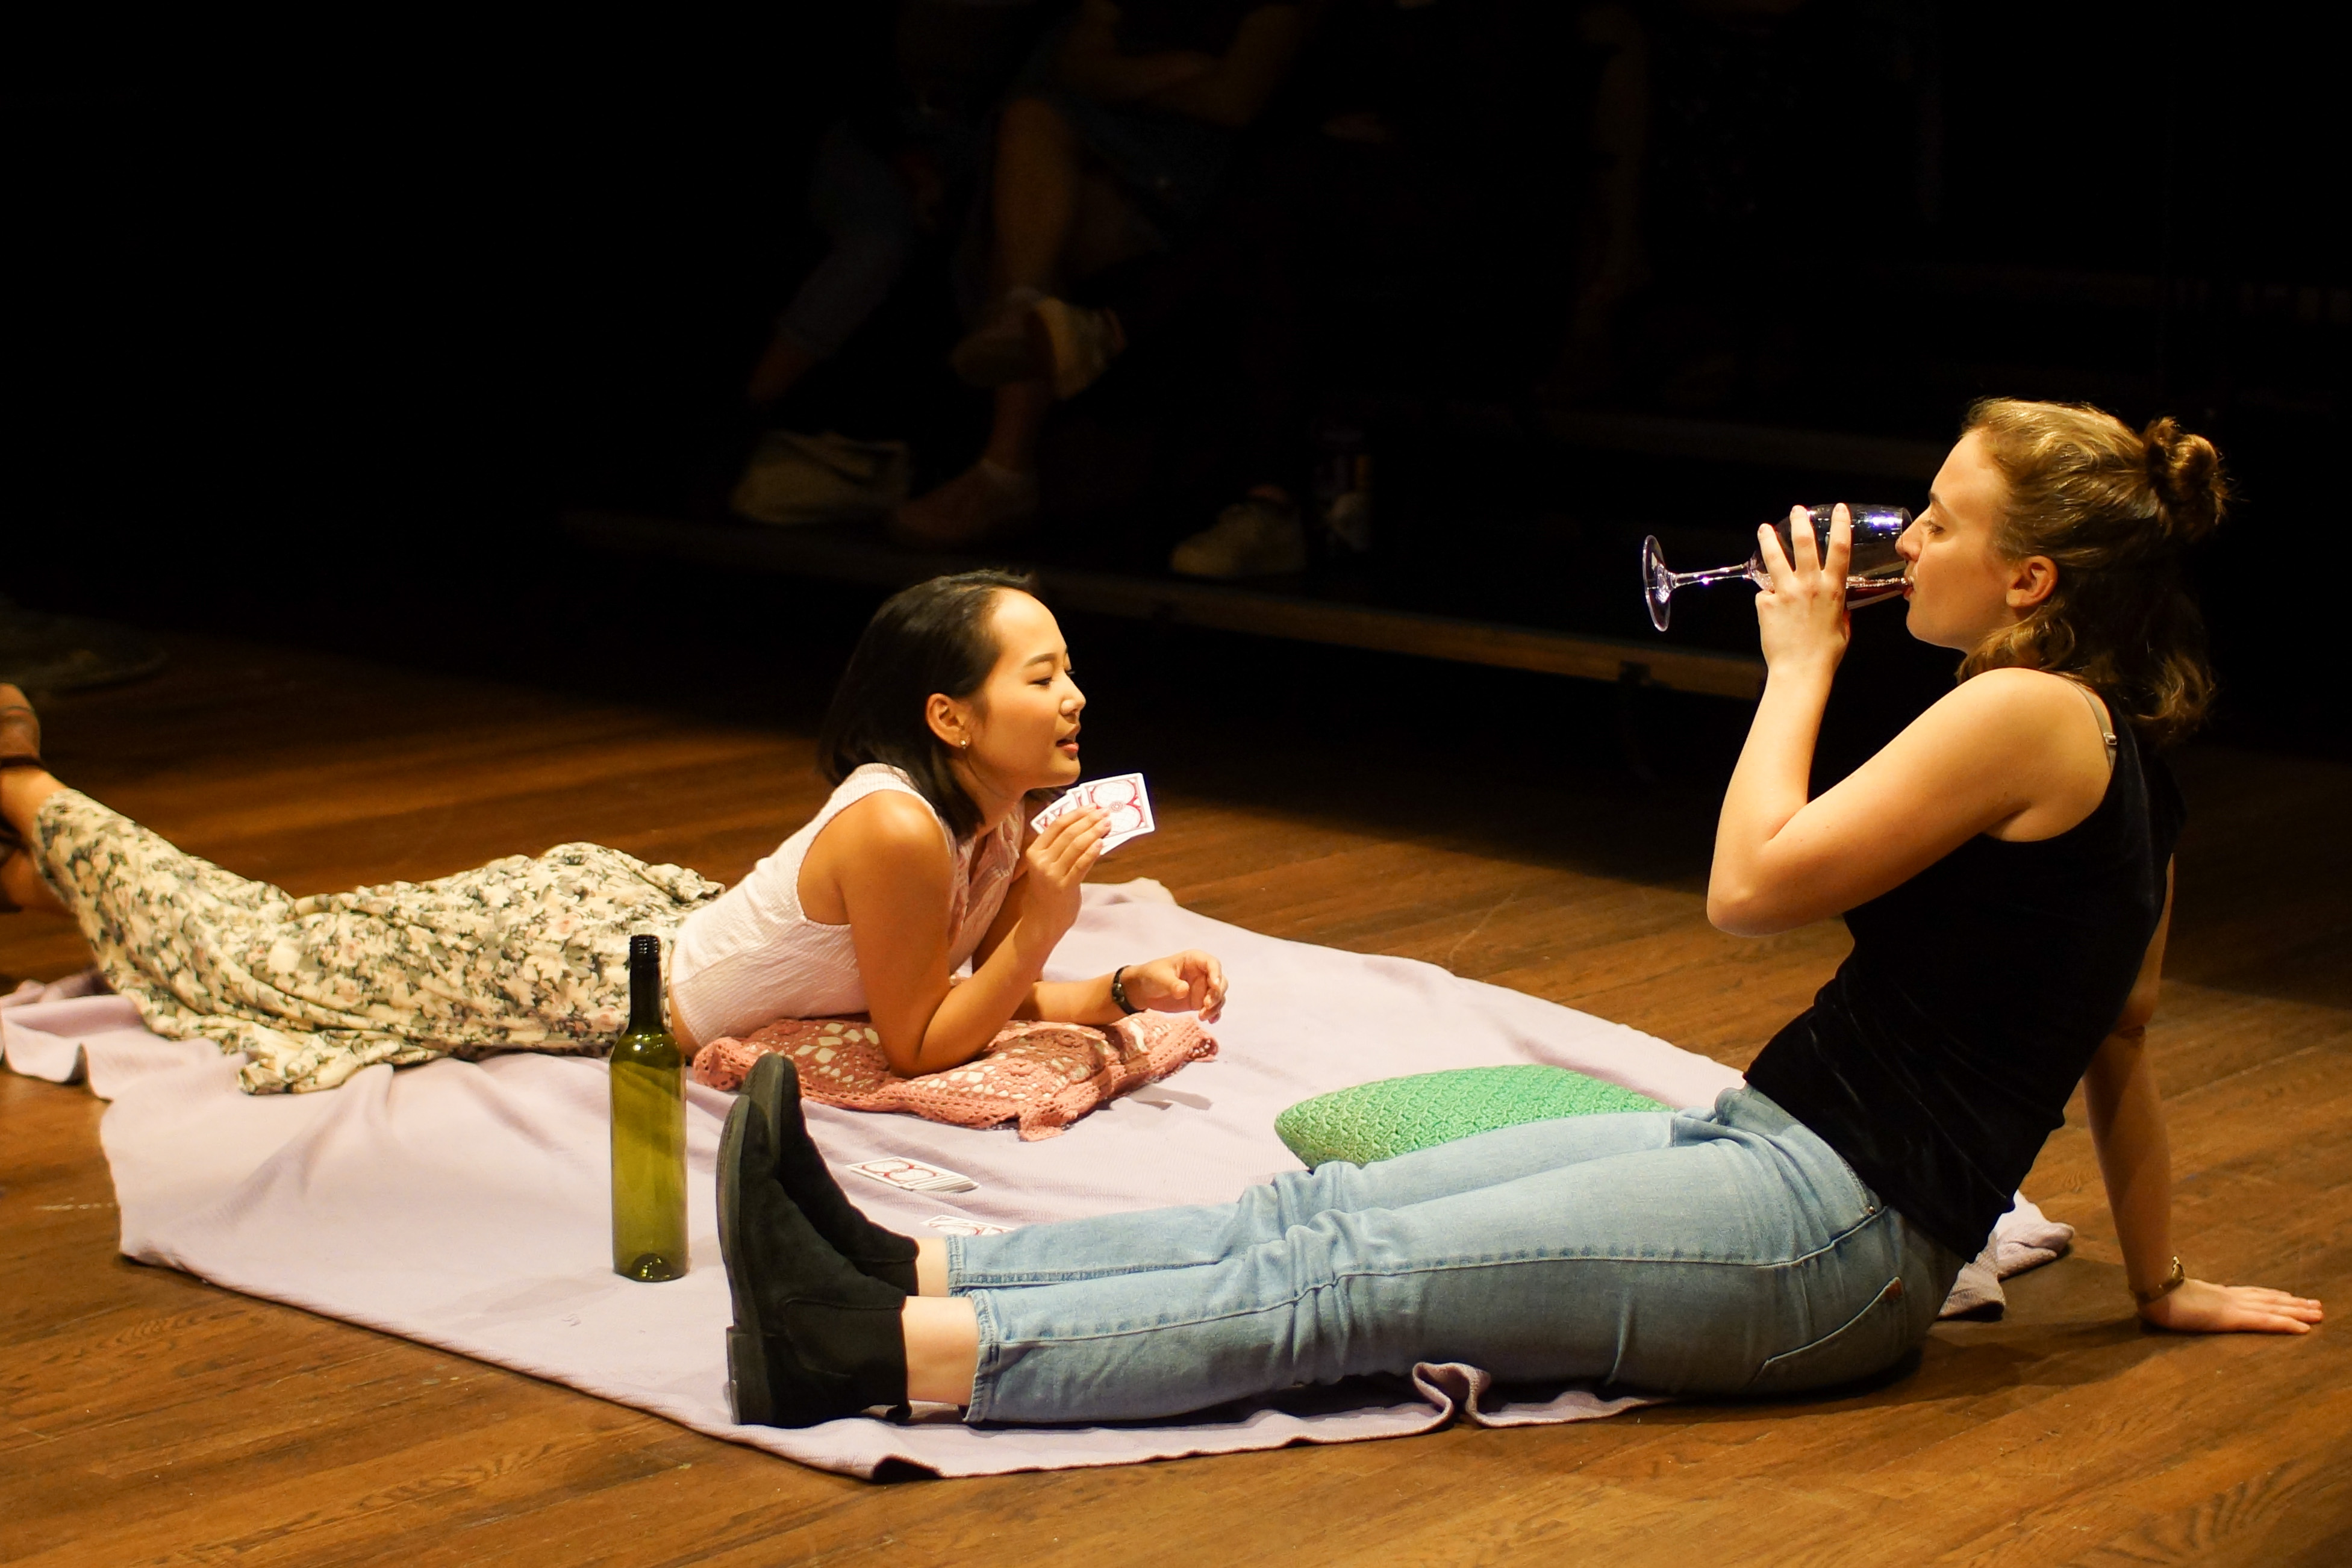 Anna Yeo, Staff Photographer